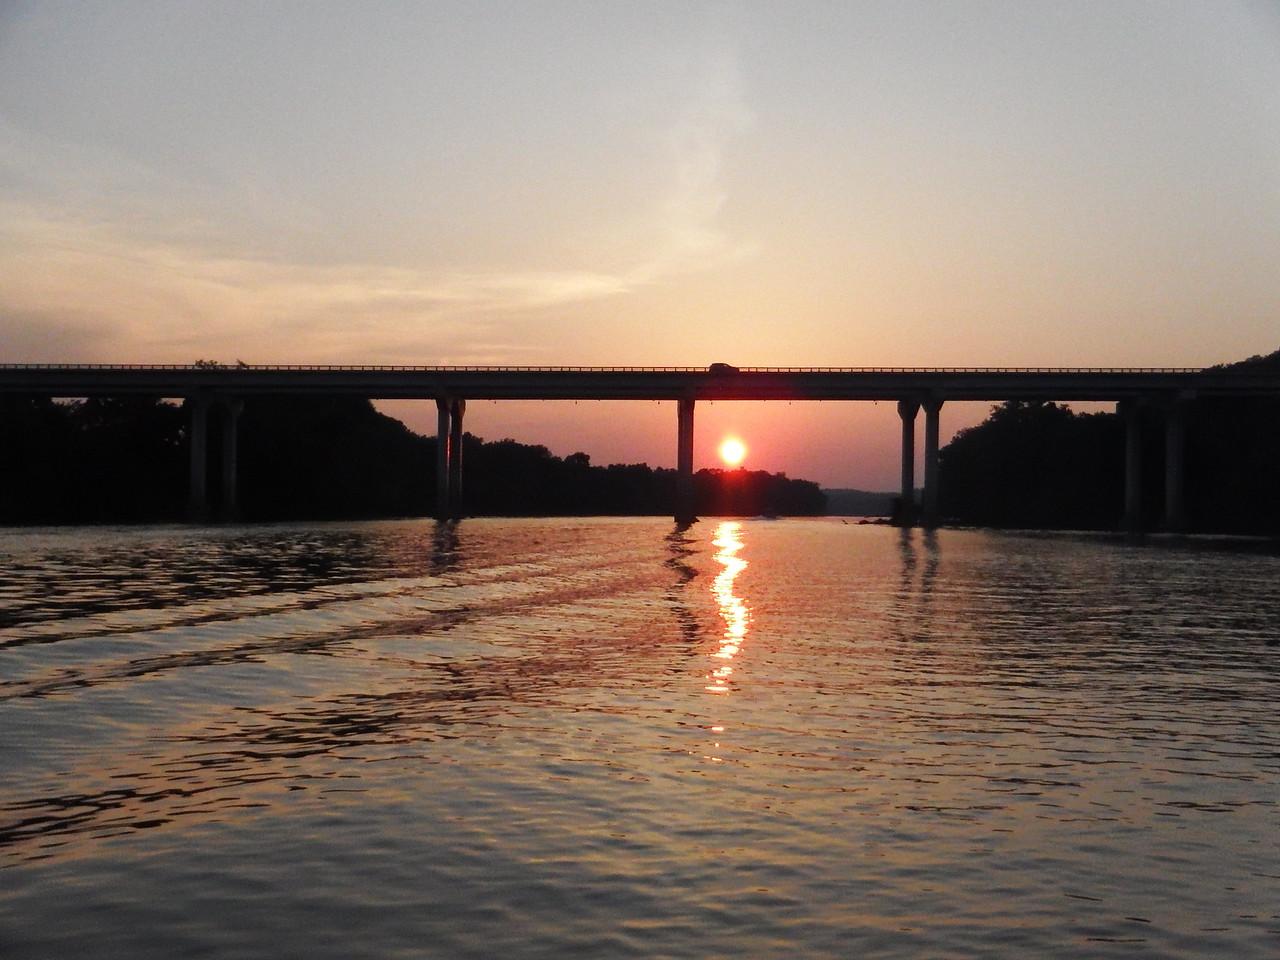 6/17 Sunset behind the 288 bridge